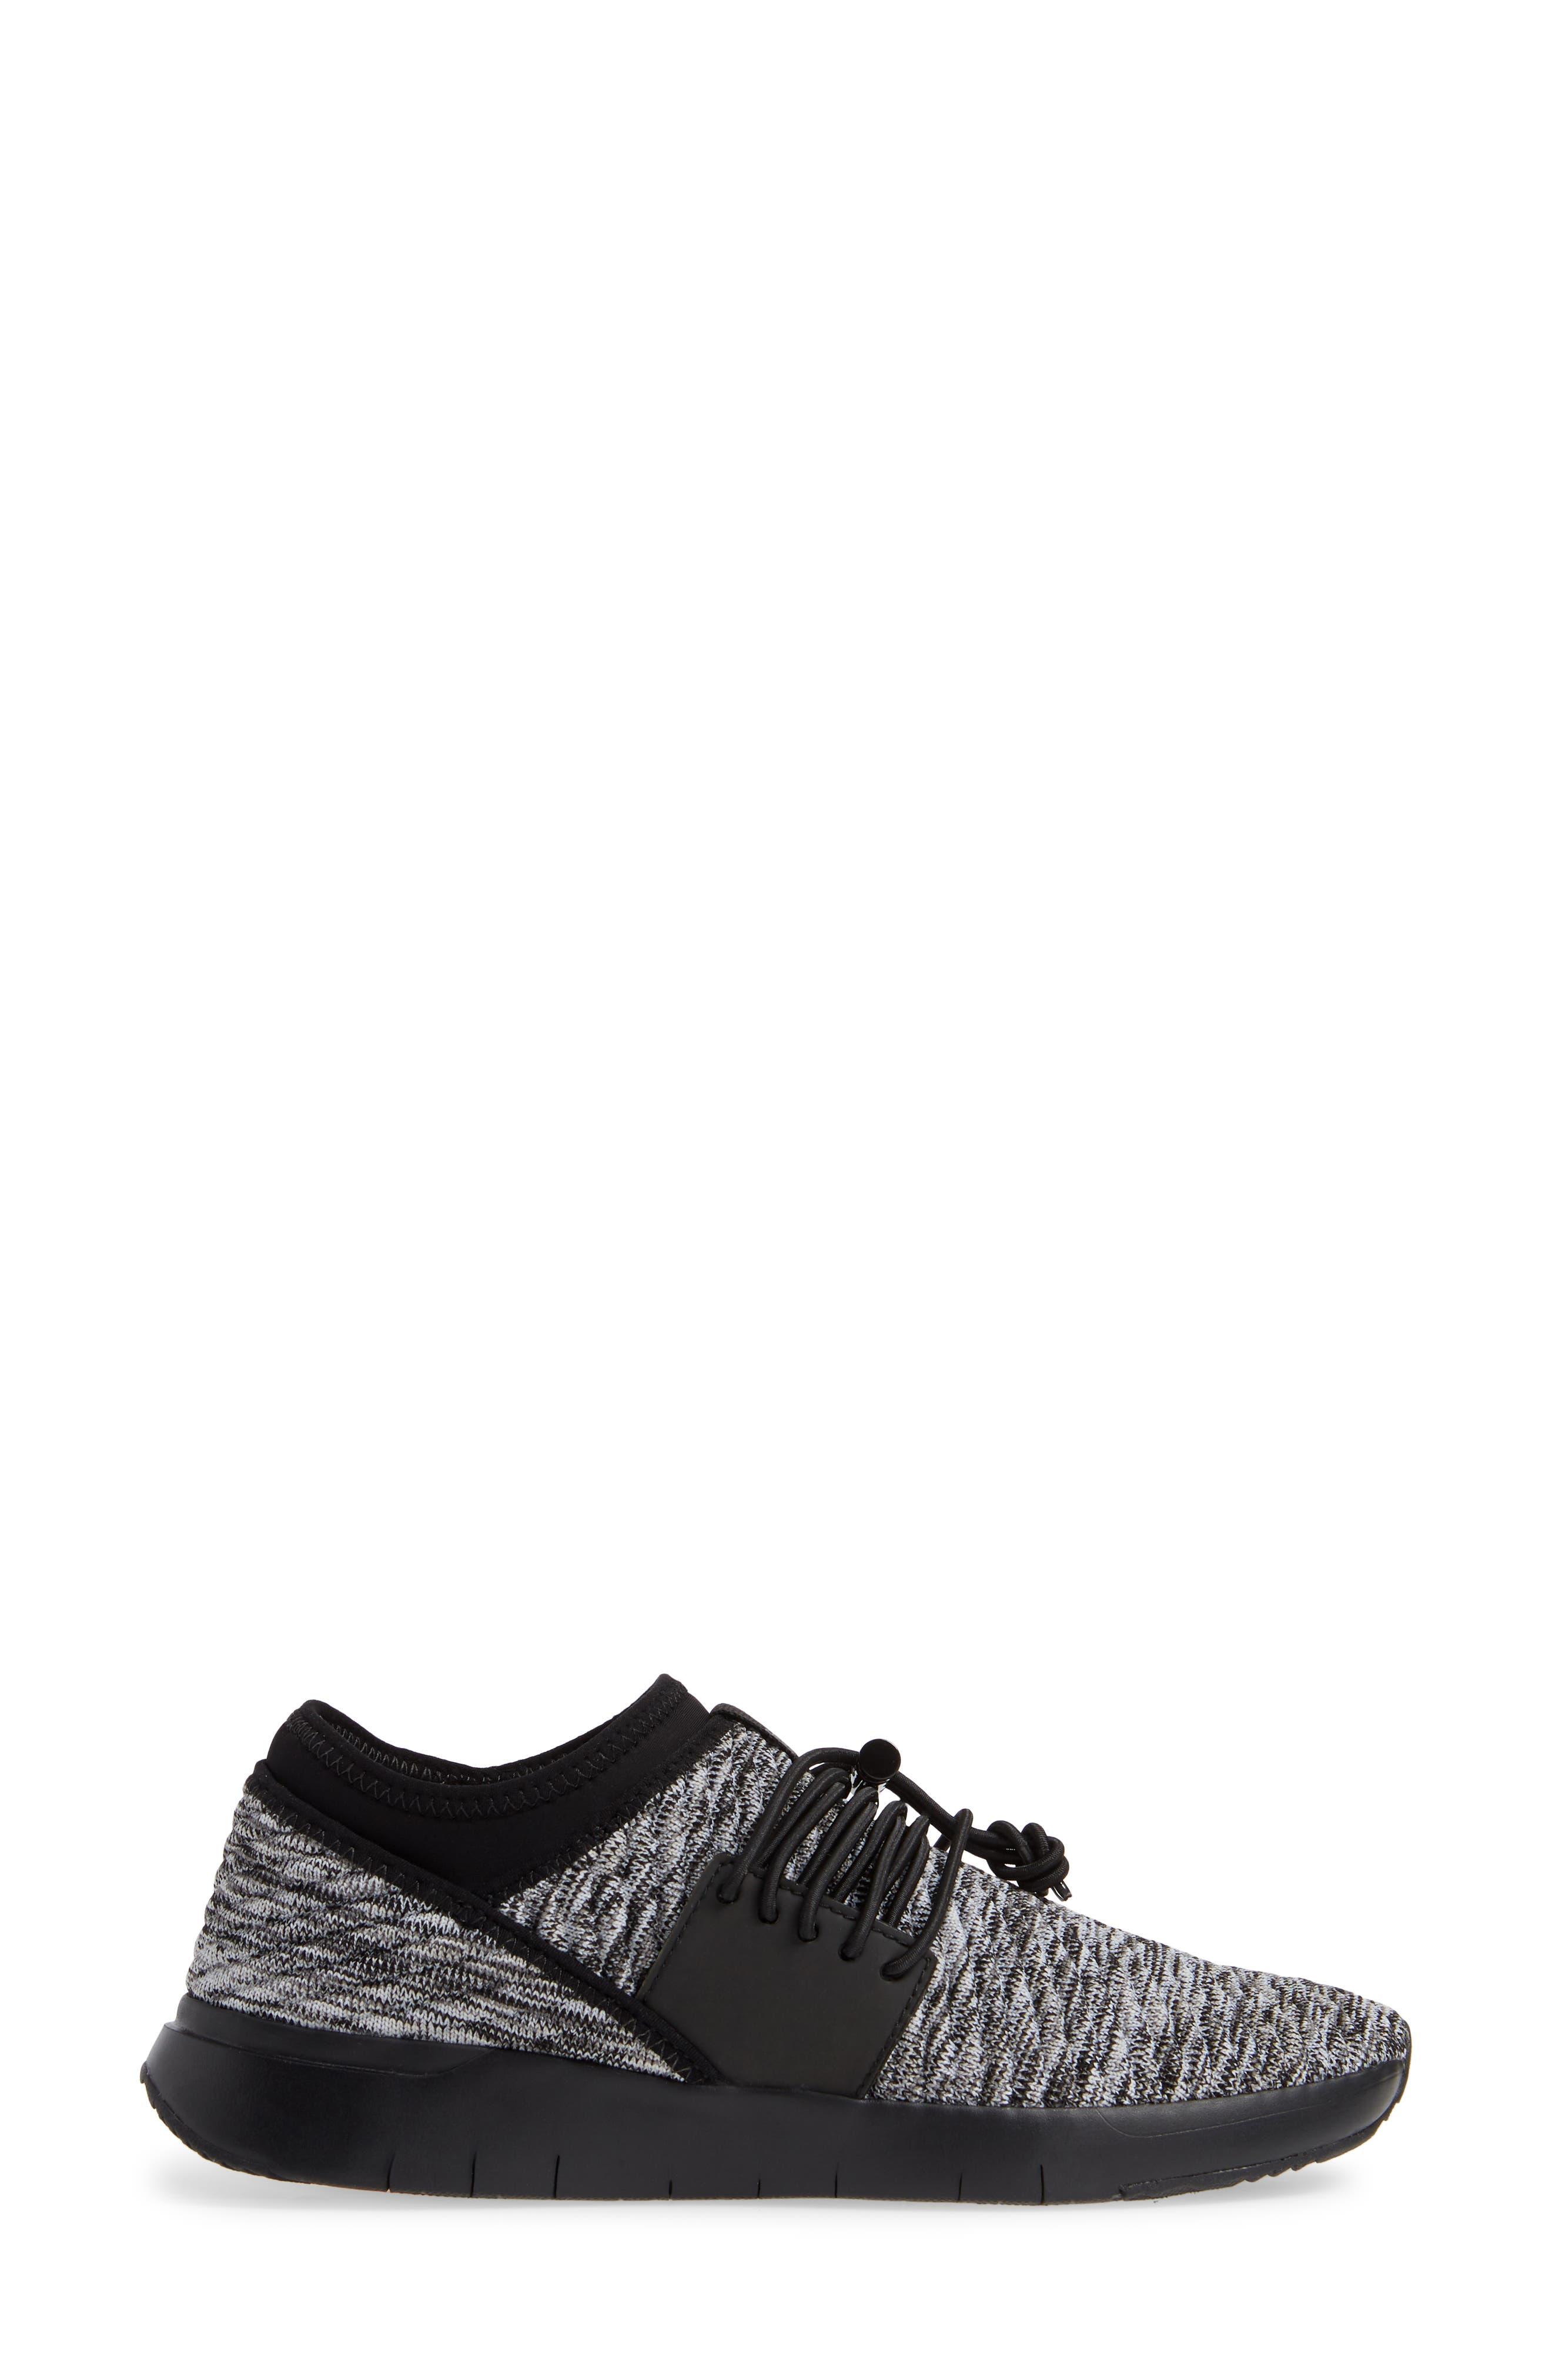 FITFLOP, Artknit Sock Sneaker, Alternate thumbnail 3, color, 017